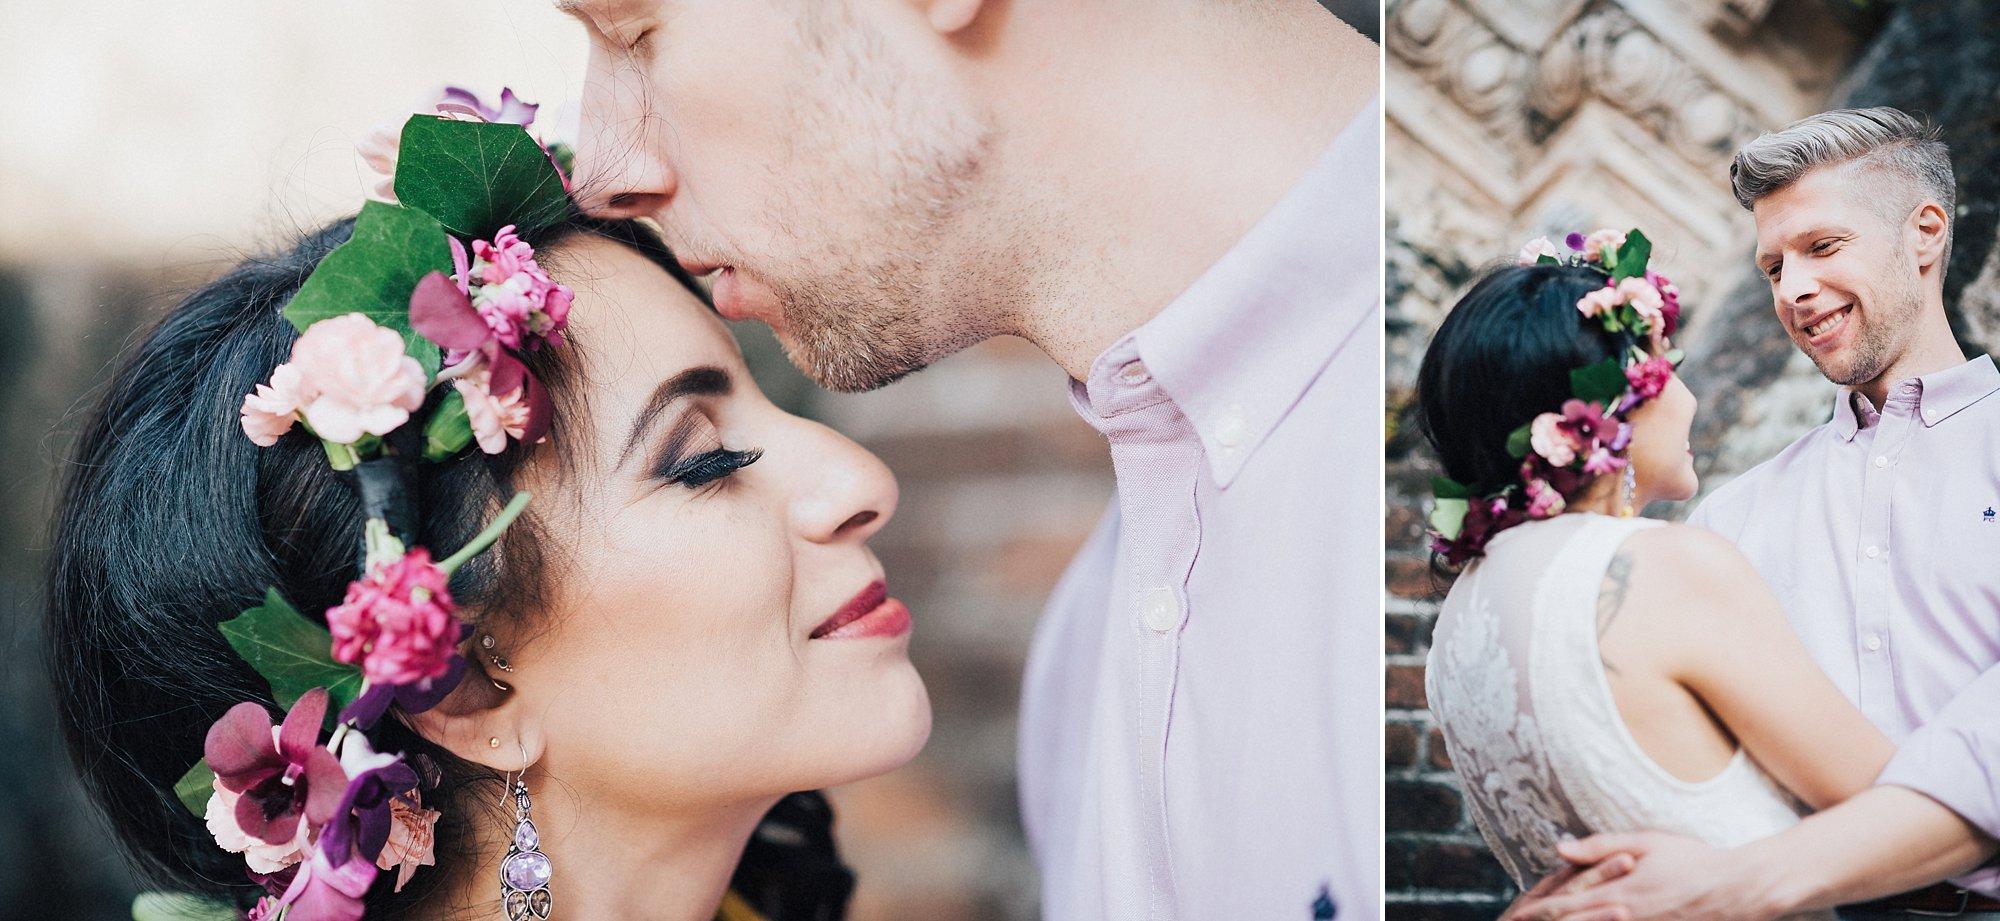 alex-yazmin-wedding-photographer-antigua-guatemala-018